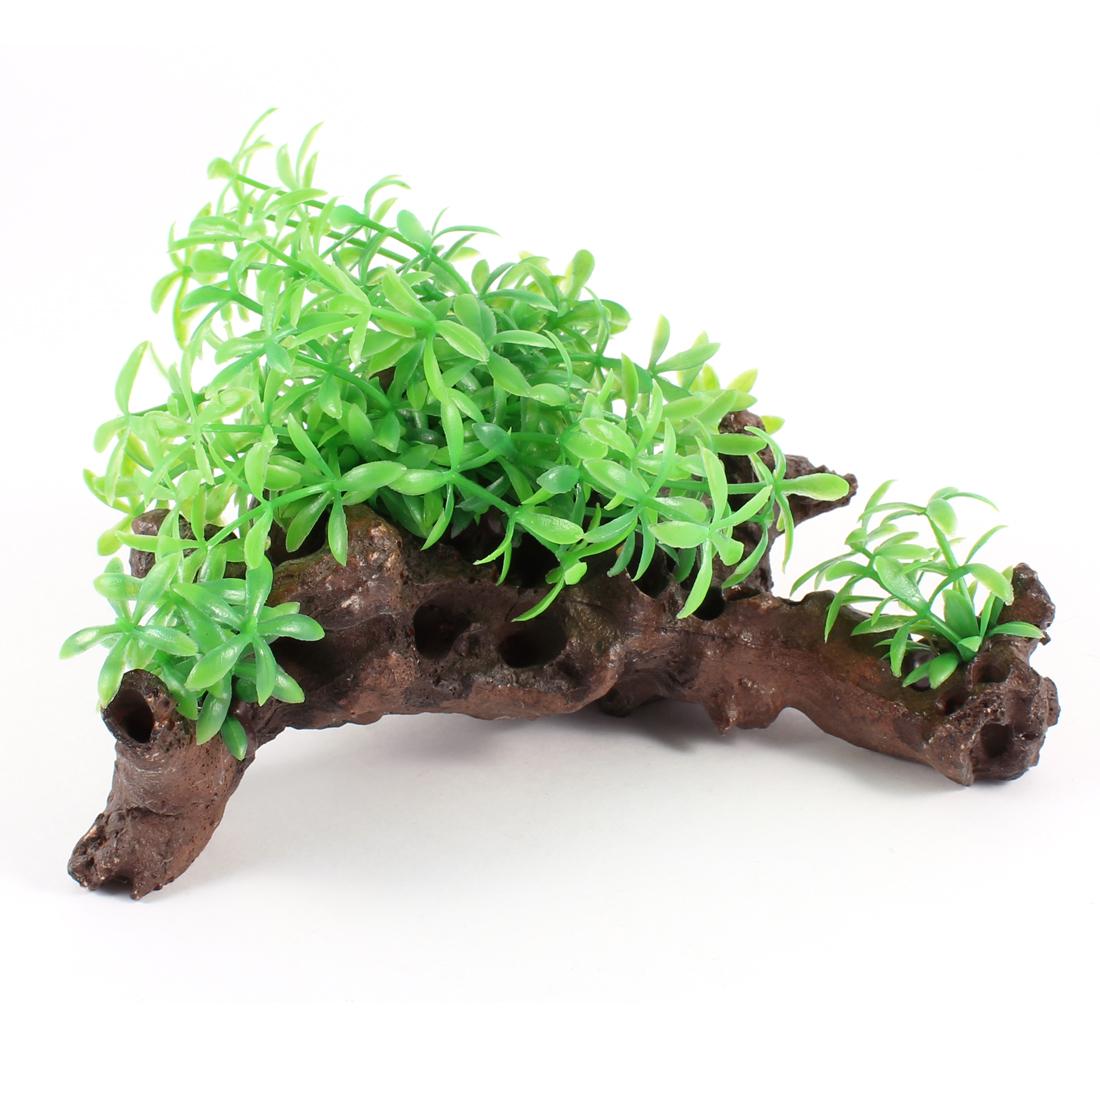 "3.5"" High Green Grass Resin Rockwork Underwater Ornament for Aquarium"